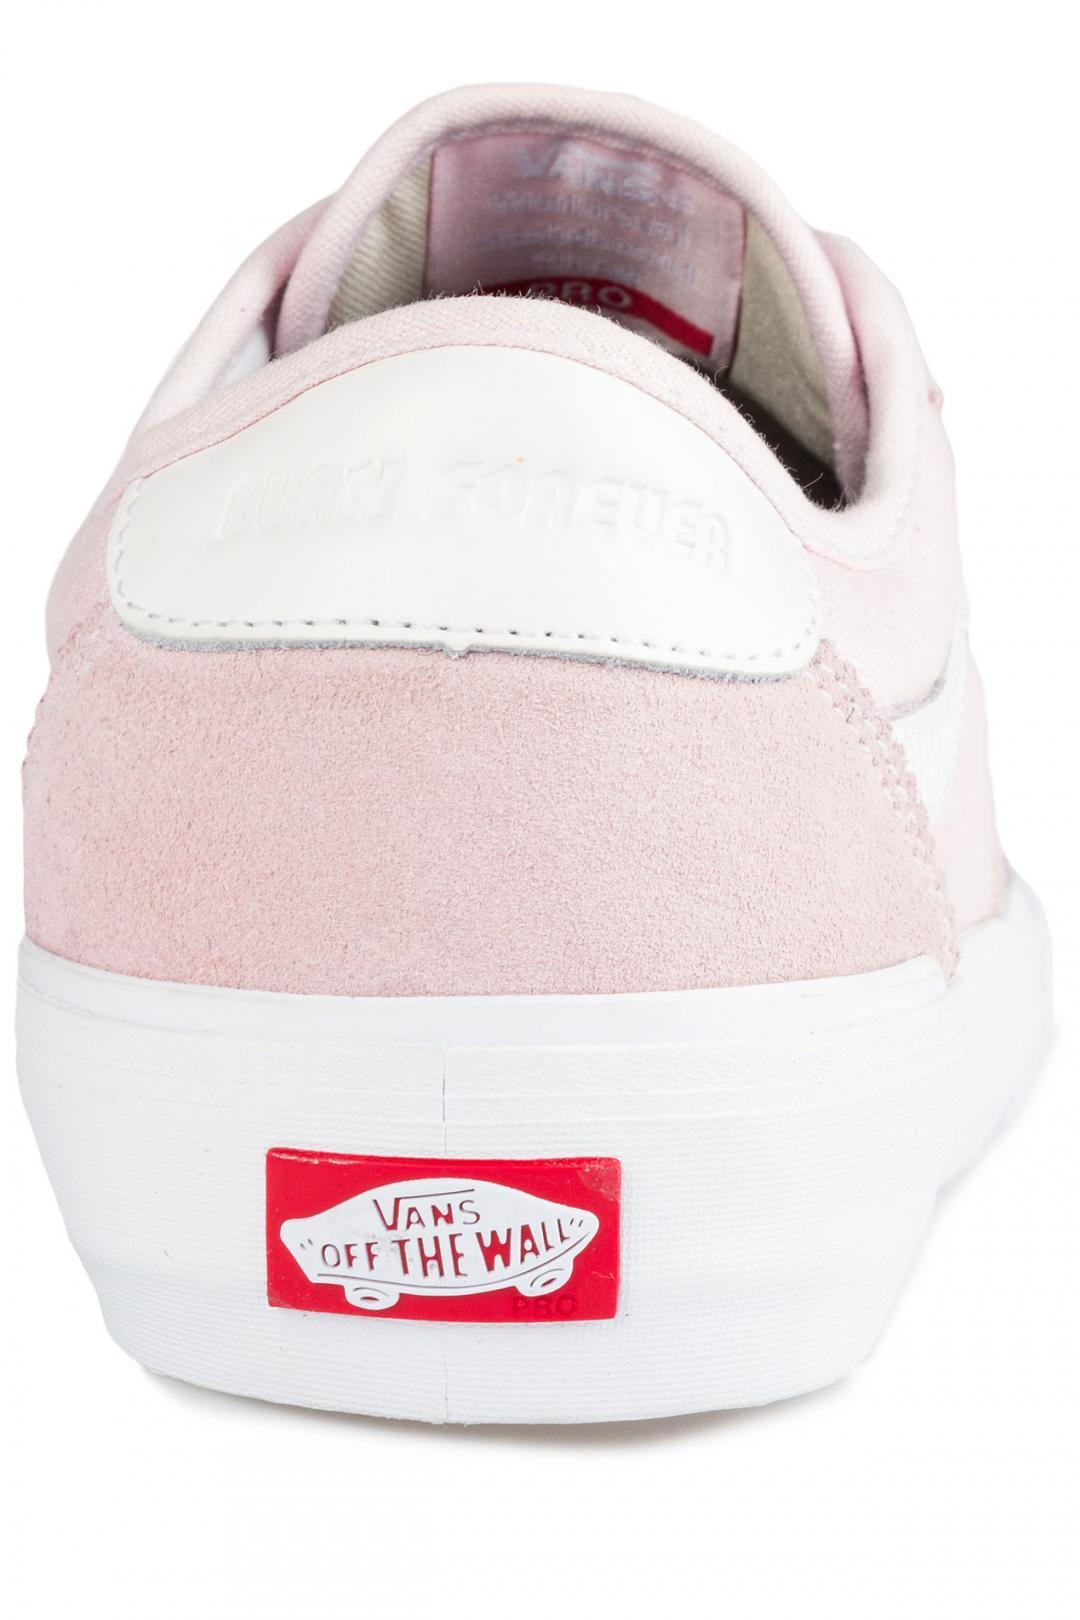 Uomo Vans x Spitfire Chima Pro 2 pink   Scarpe da skate